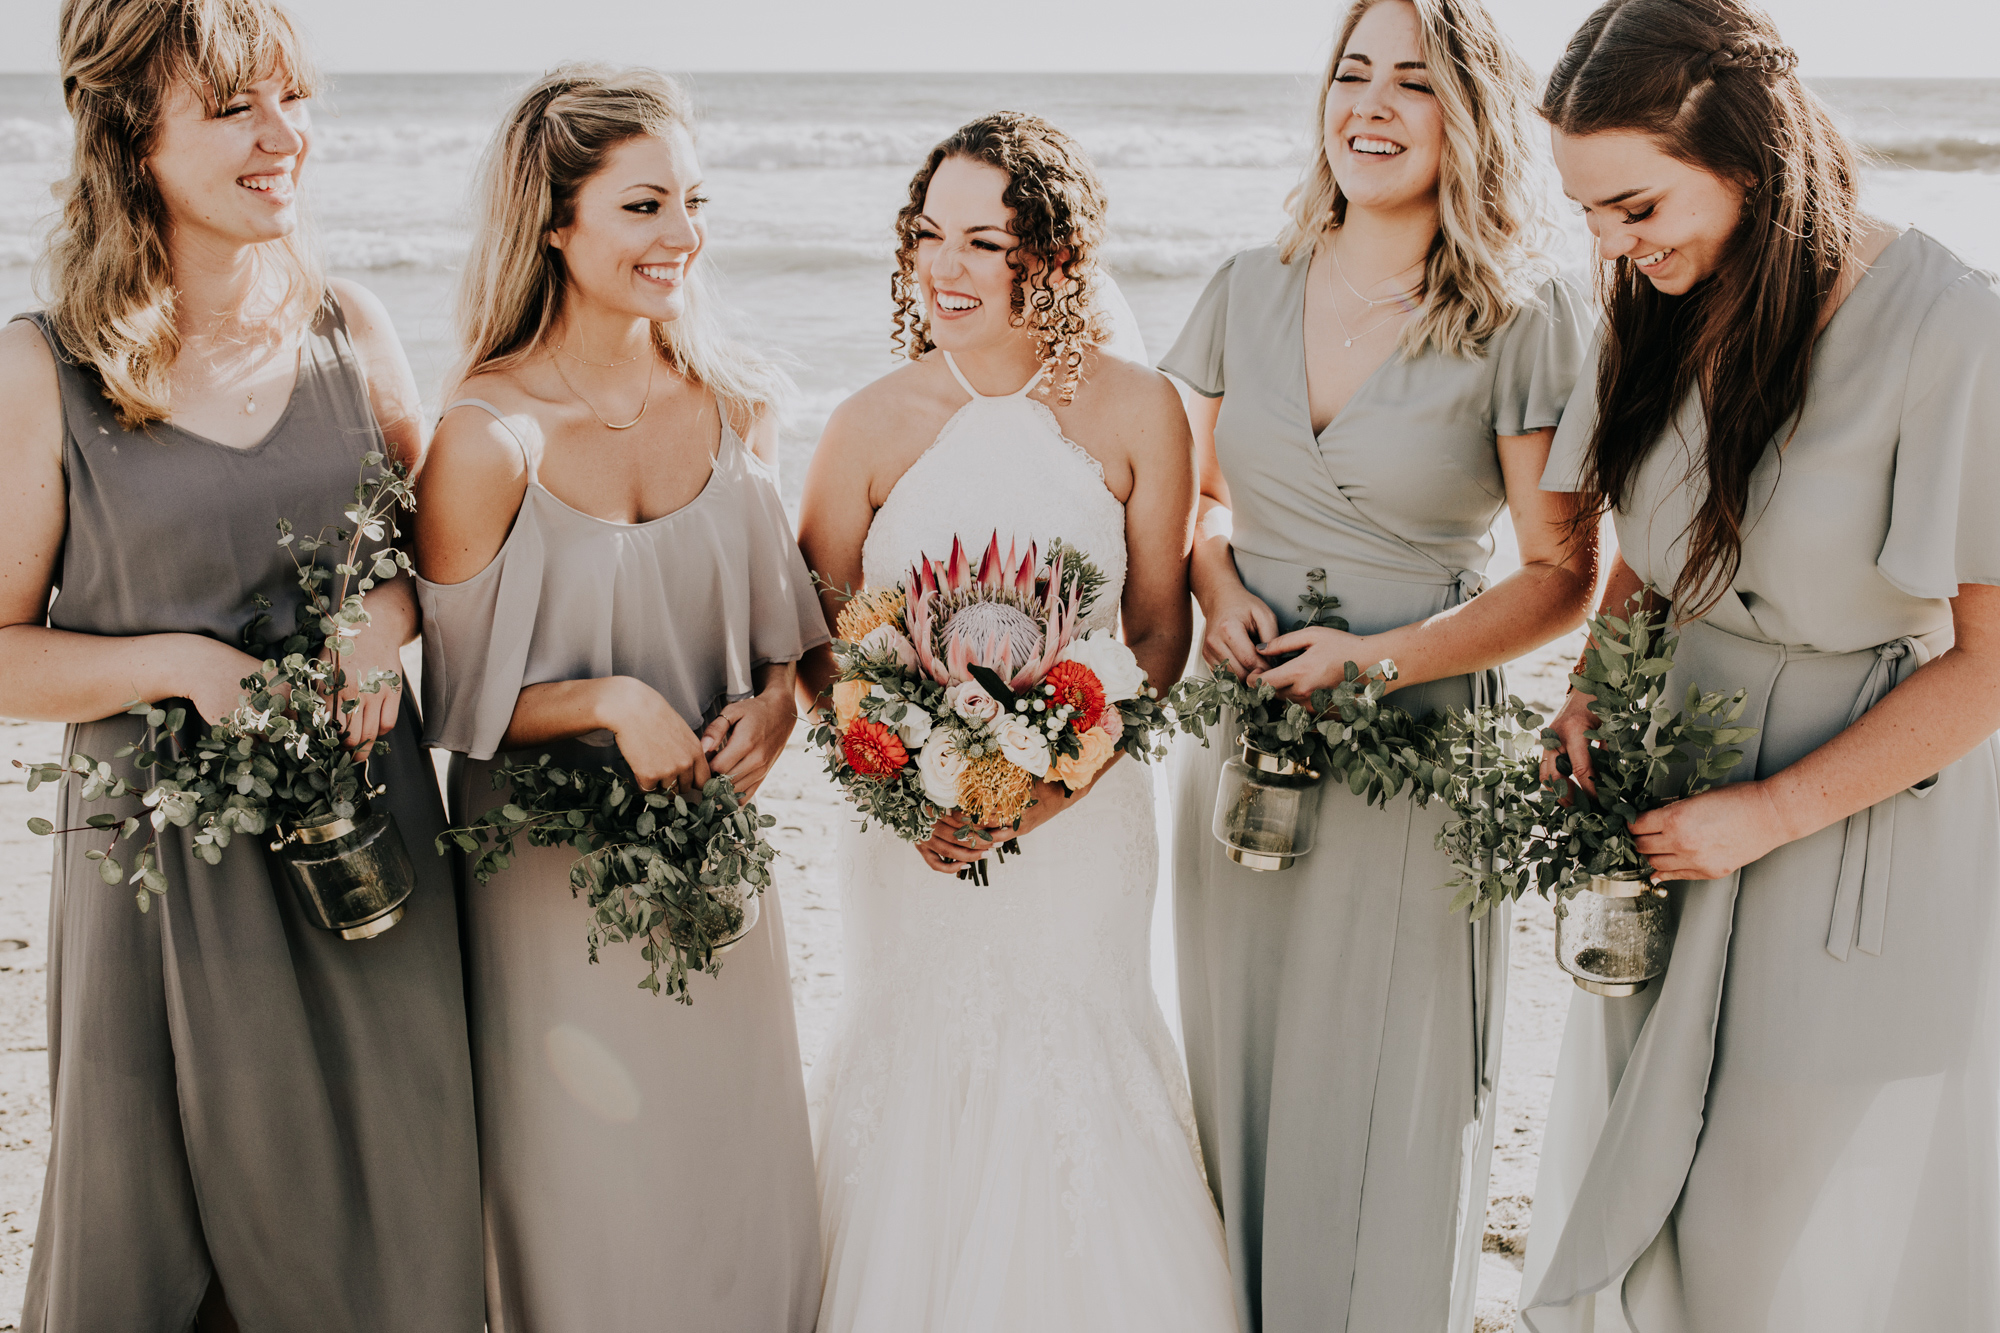 100-destination-wedding-san-clemente-california.jpg